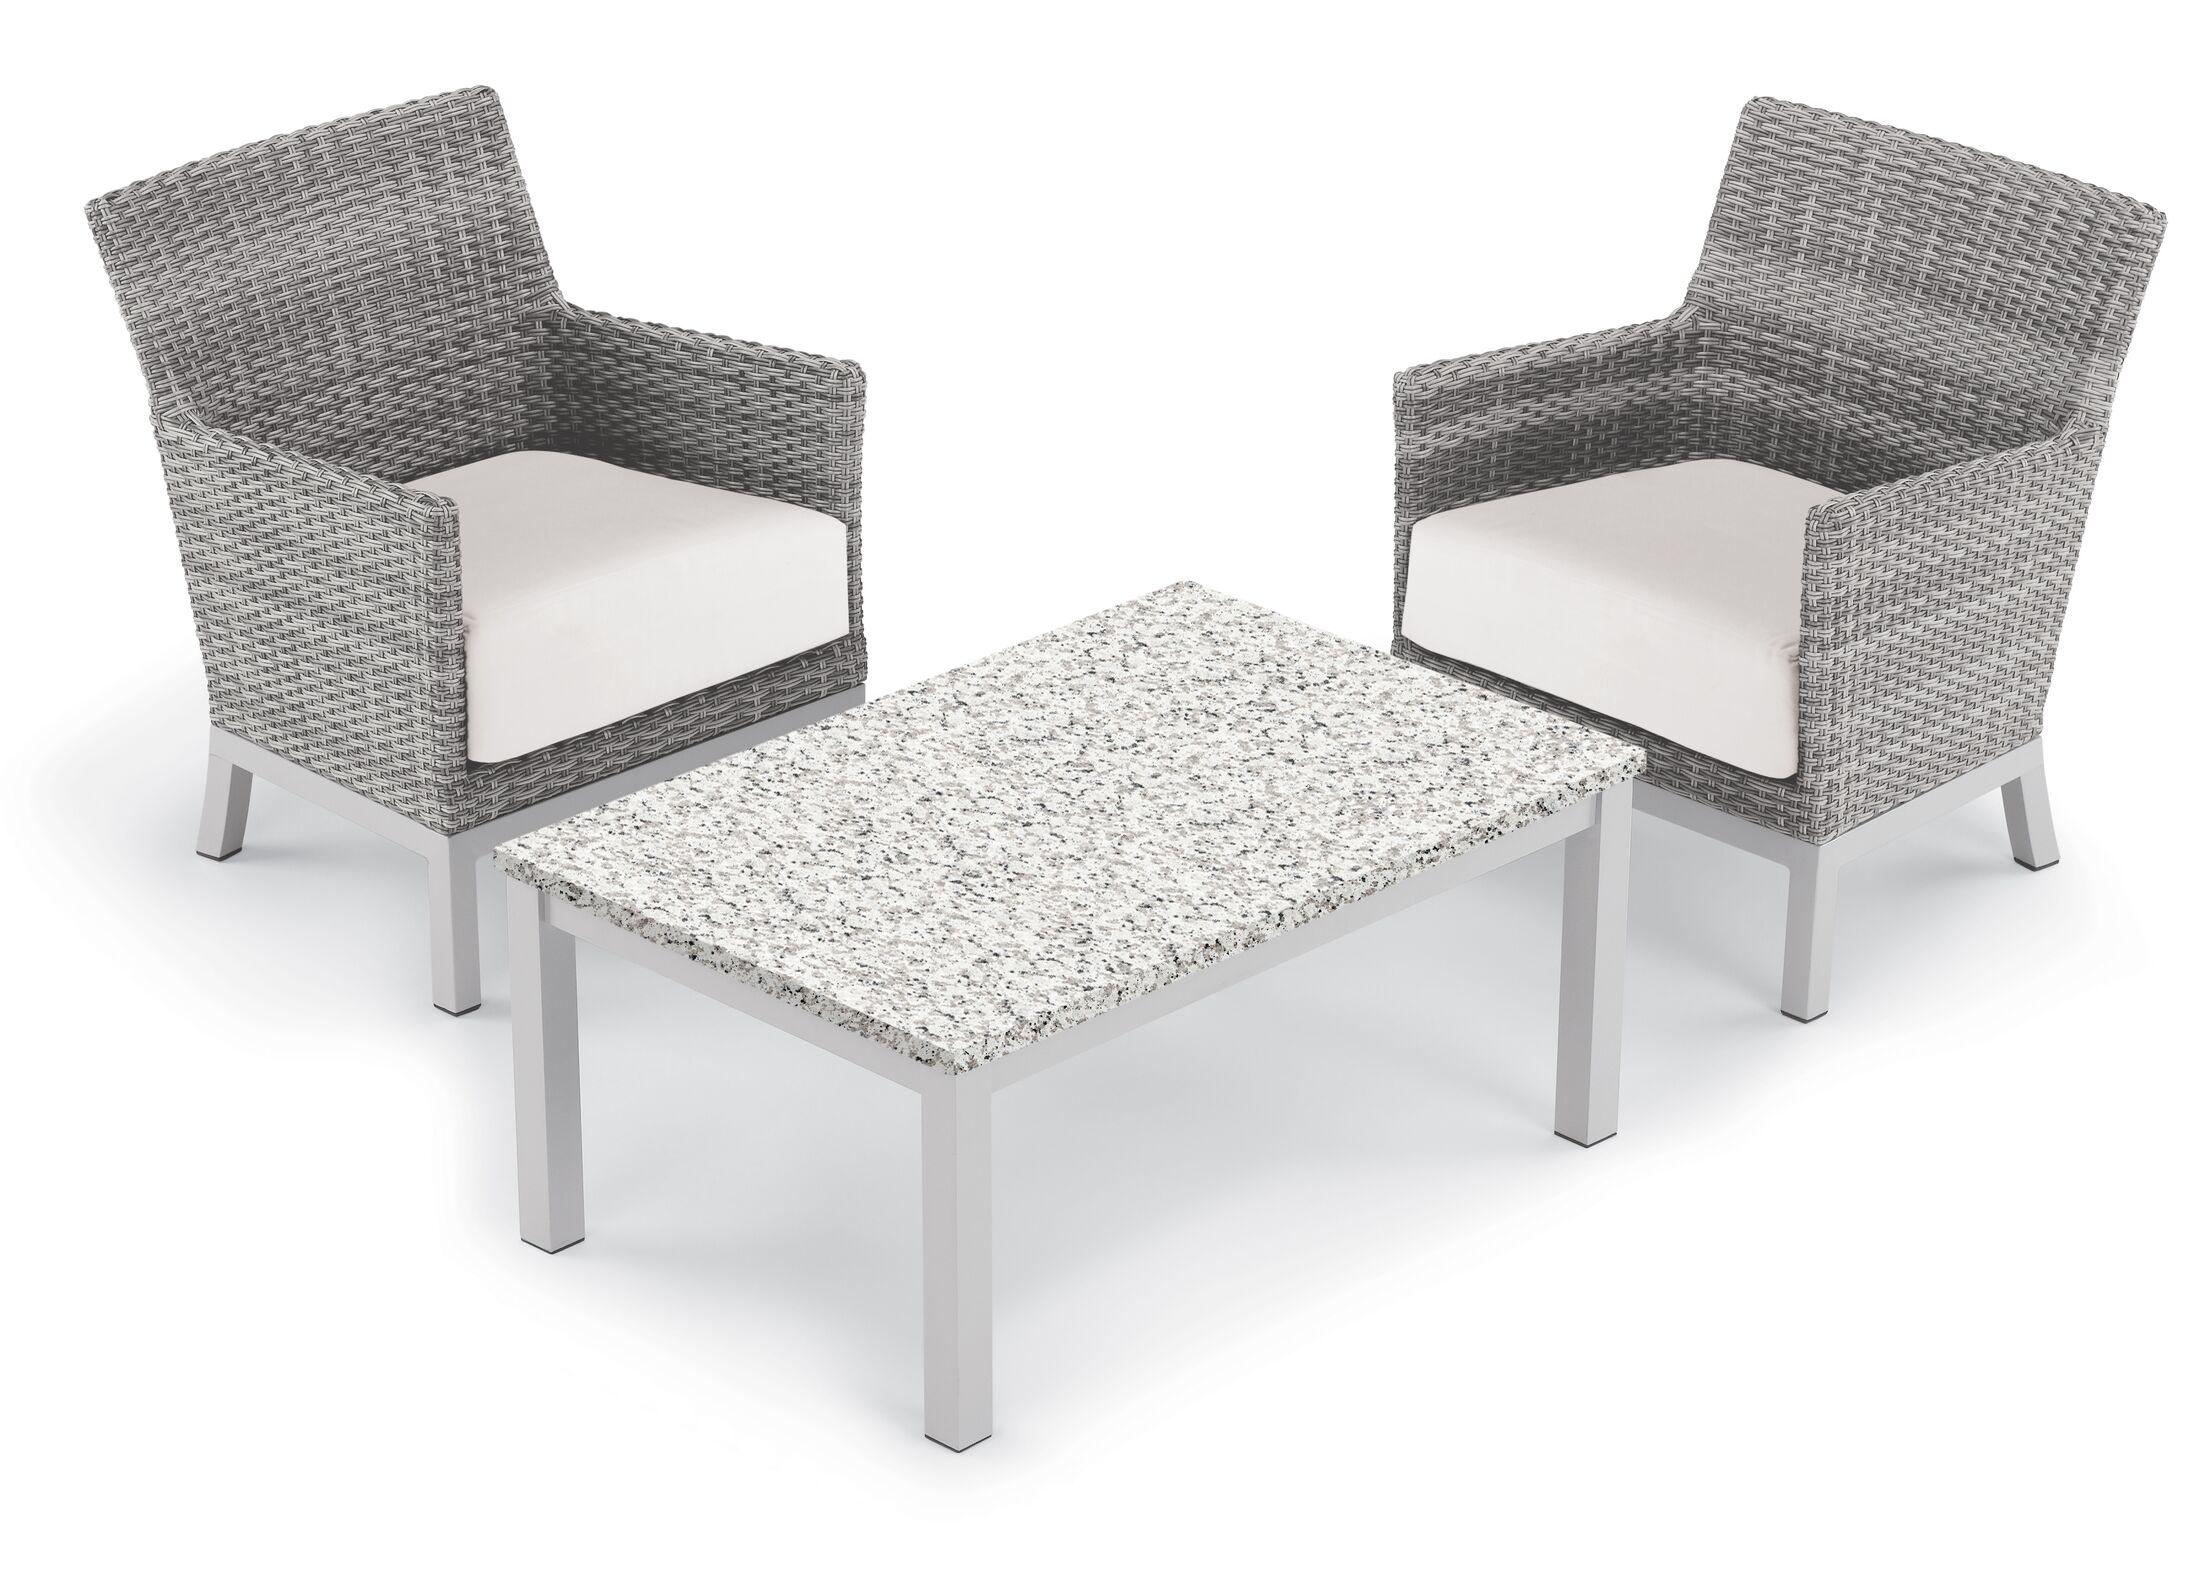 Saint-Pierre 3 Piece Club Rattan Conversation Set with Cushions Cushion Color: Eggshell White